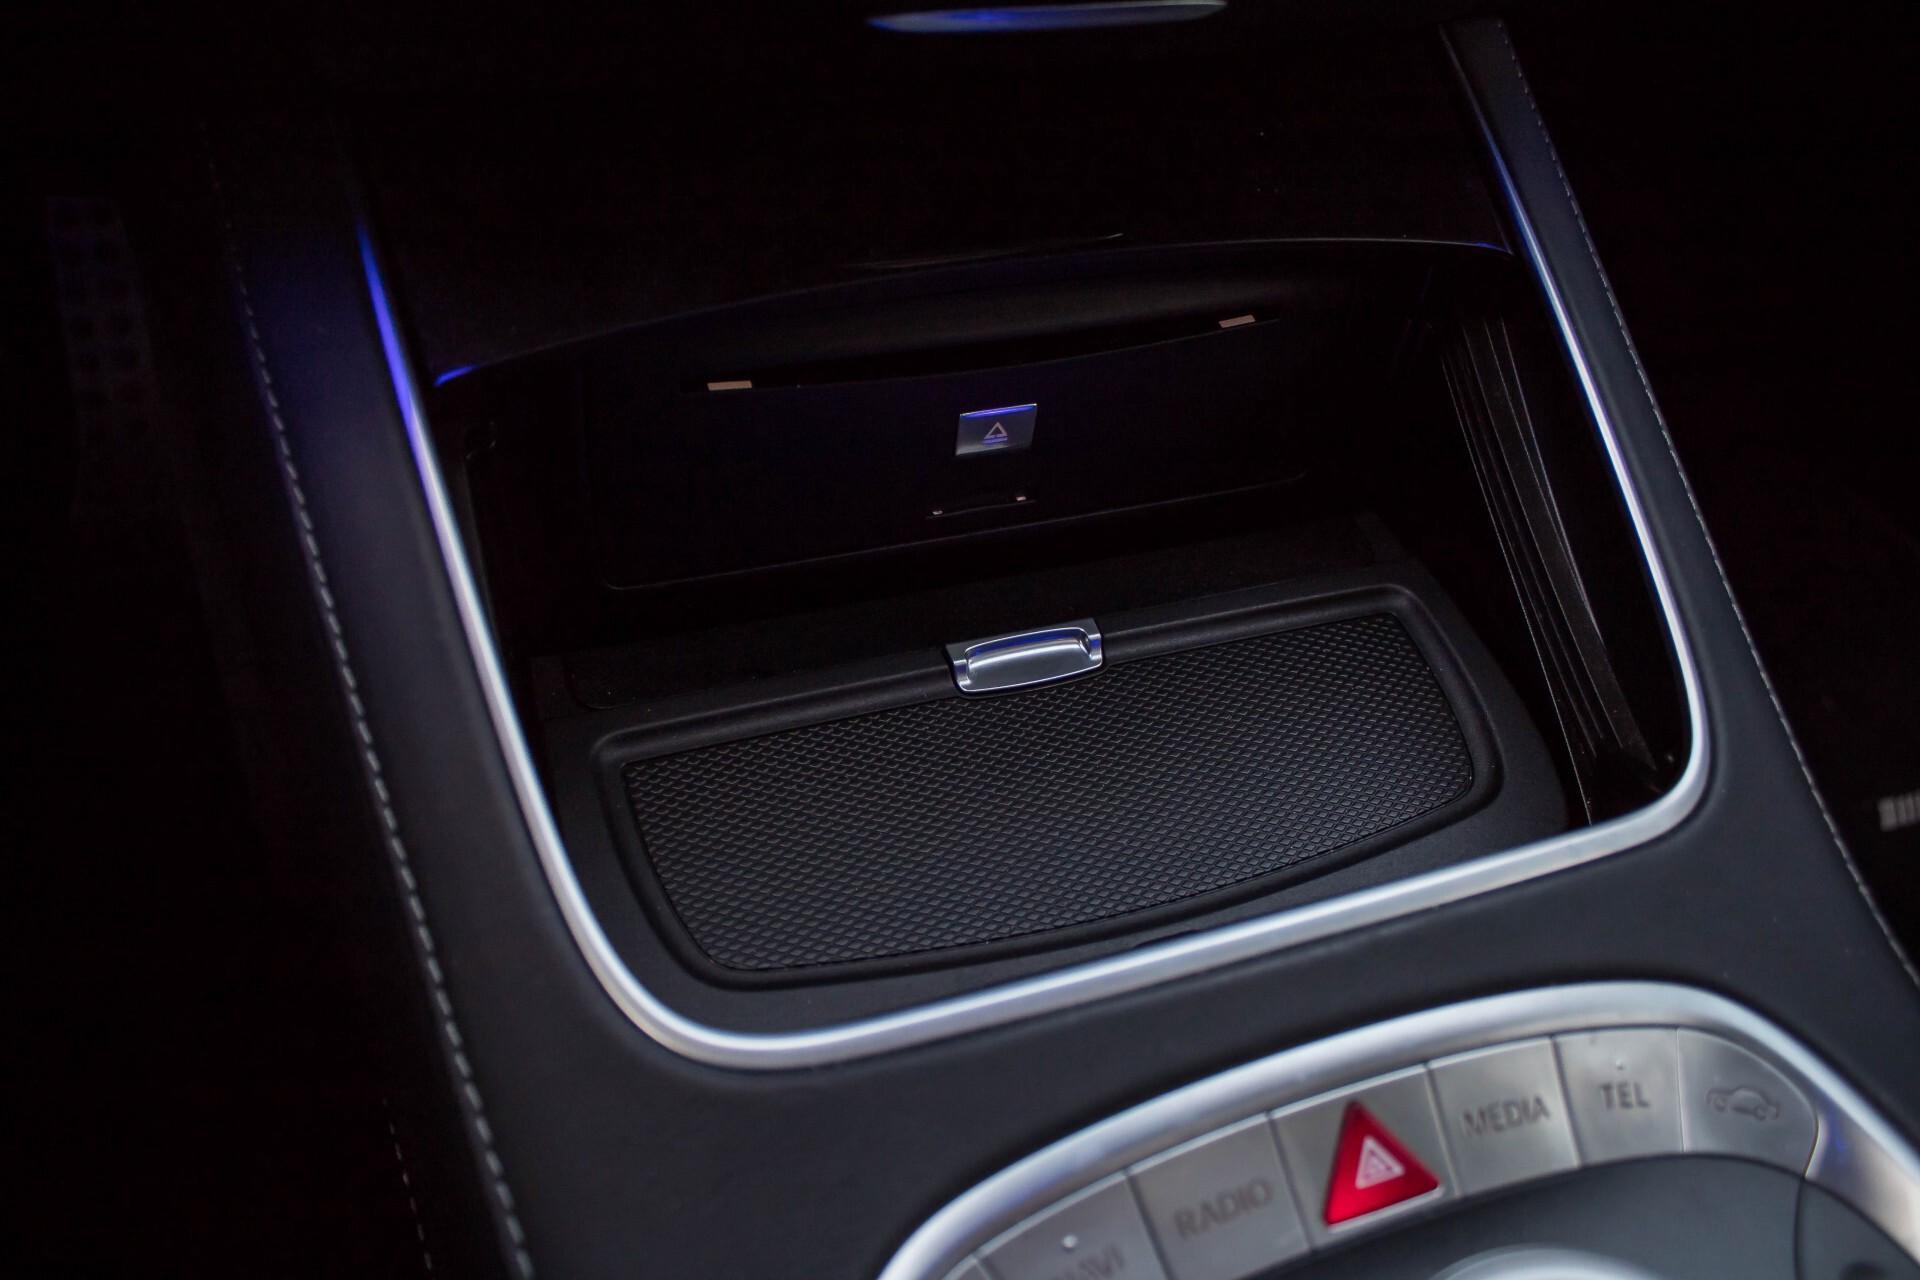 Mercedes-Benz S-Klasse 350 BlueTEC 63 AMG Panorama/Distronic/Keyless/Massage/Burmester Aut7 Foto 20